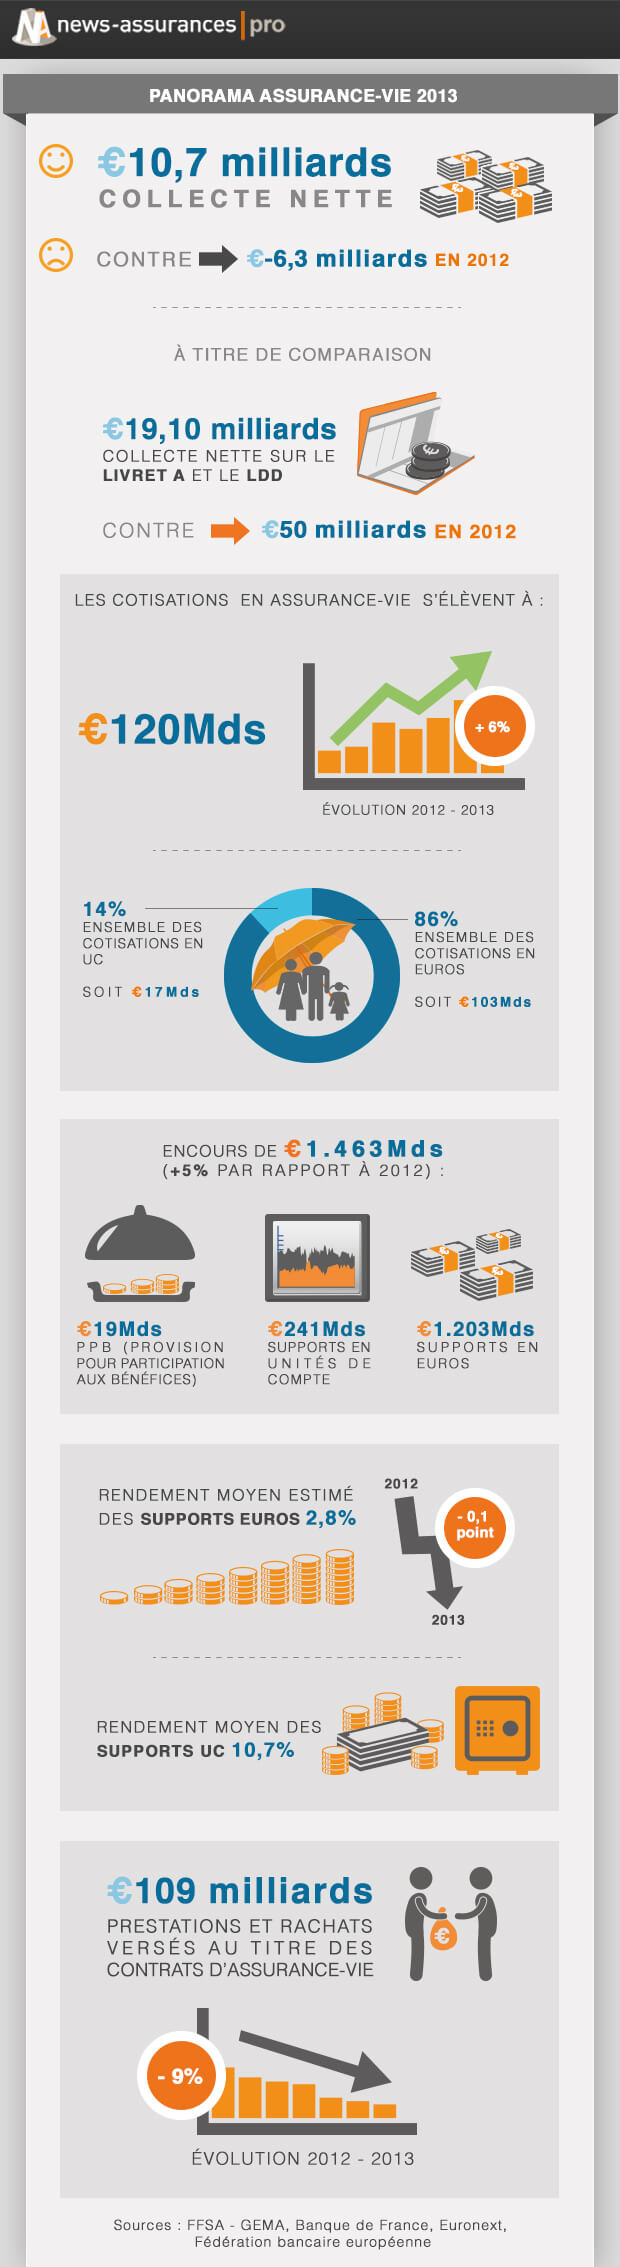 infographie assurances vie 2013